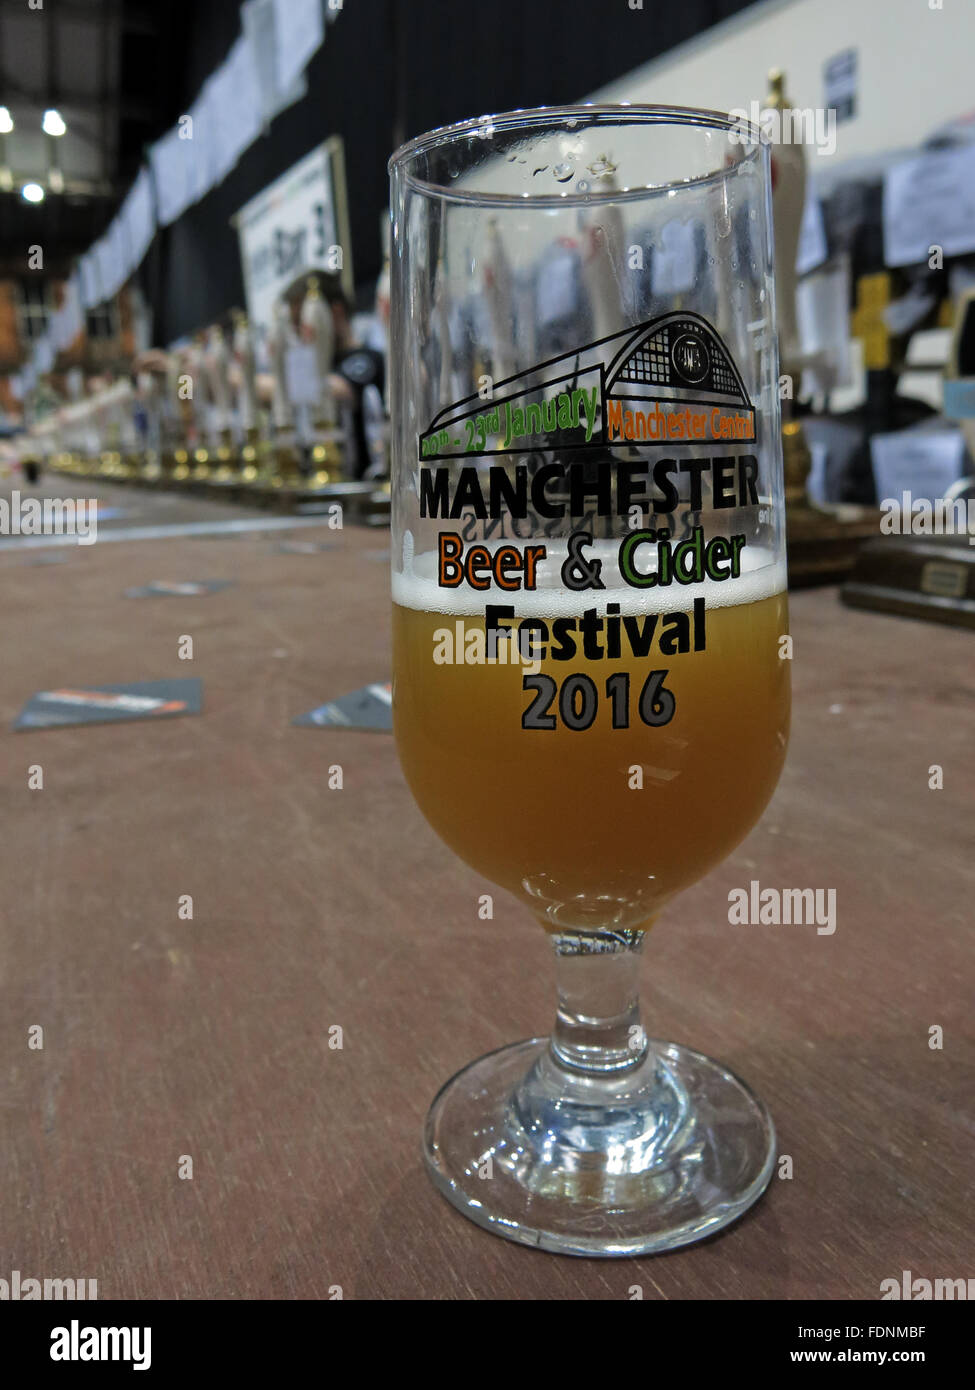 Laden Sie dieses Alamy Stockfoto Manchester Central CAMRA Winter Bierfest 2016, Lancs, England, UK-Bierglas - FDNMBF